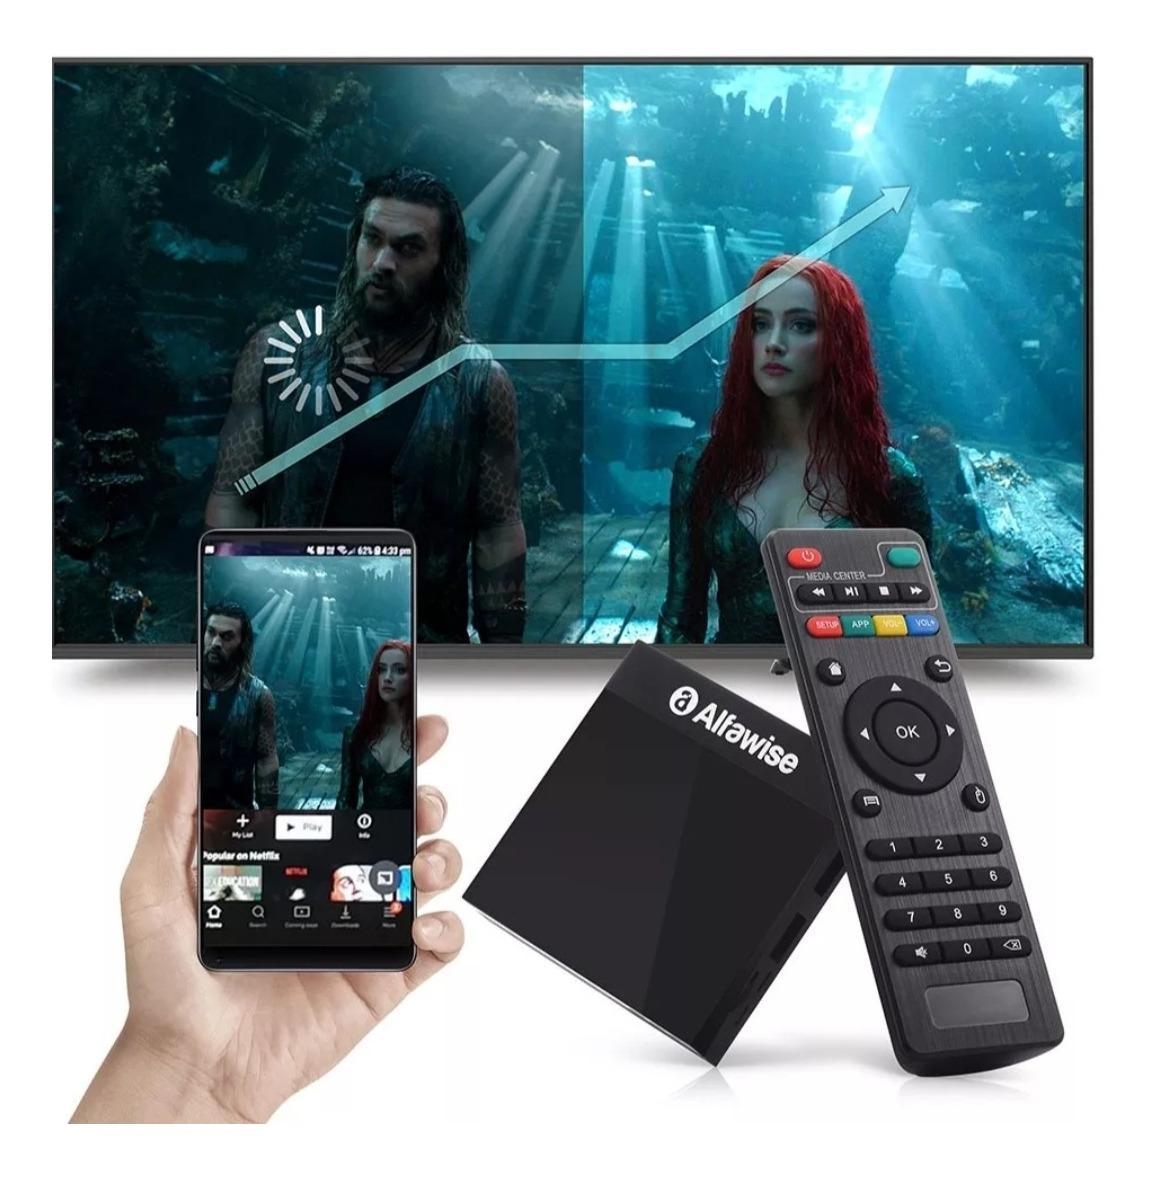 Tv Box A9 Android 8 1 2gb Ram 16gb Mem Wifi Control Omm